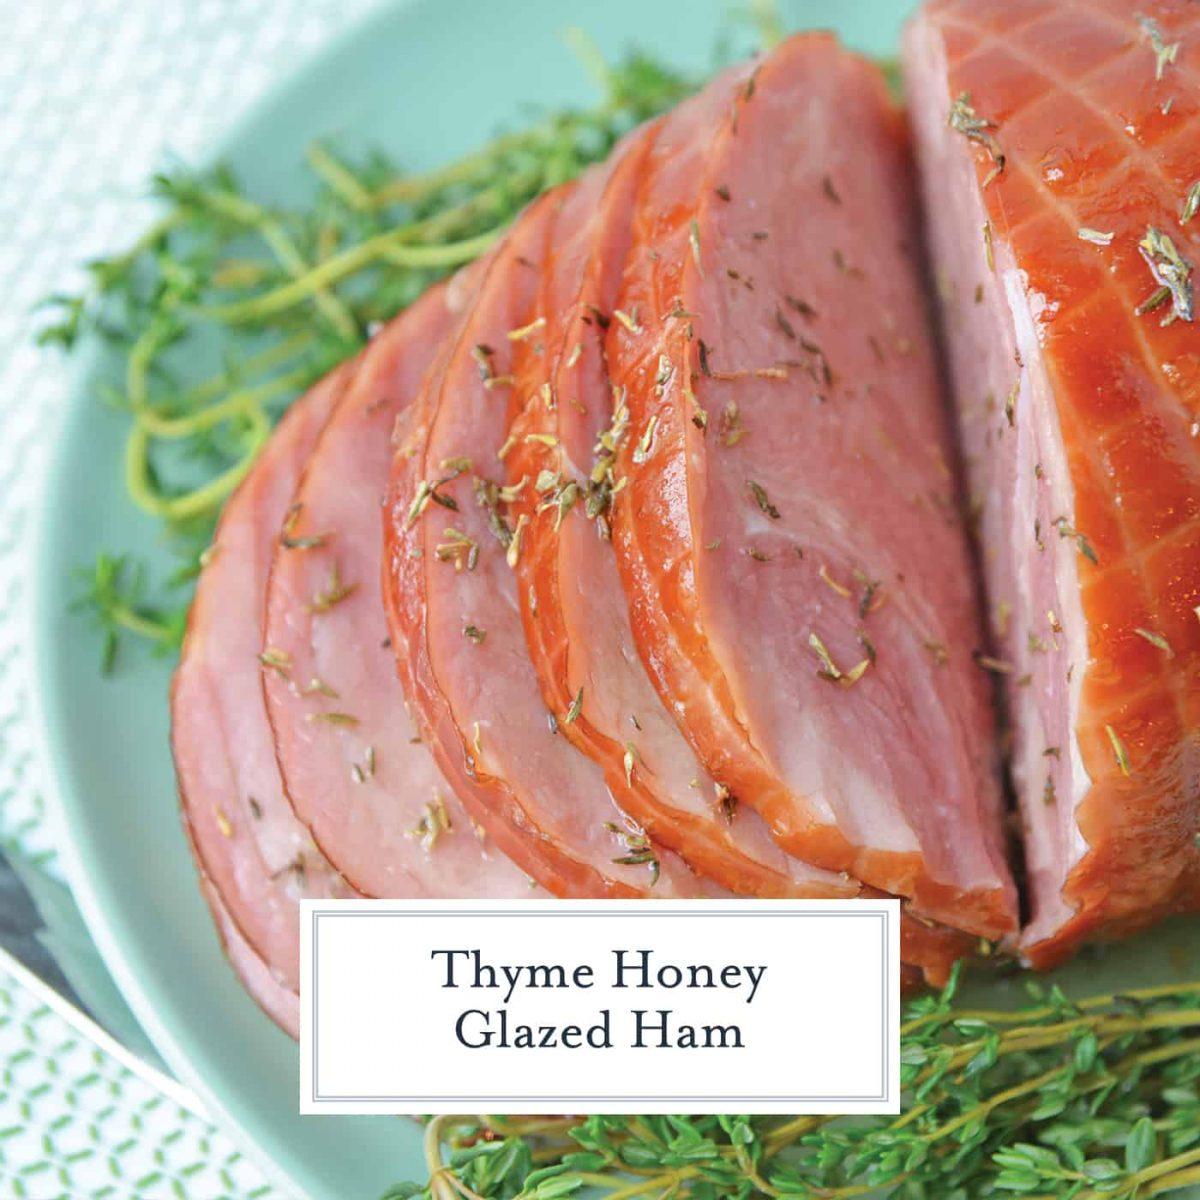 Thyme Honey Glazed Ham is a light and flavorful ham glaze recipe the whole family will enjoy. Simple to make and delicious to eat!#honeybakedham #hamglazerecipe #honeyglazedham www.savoryexperiments.com